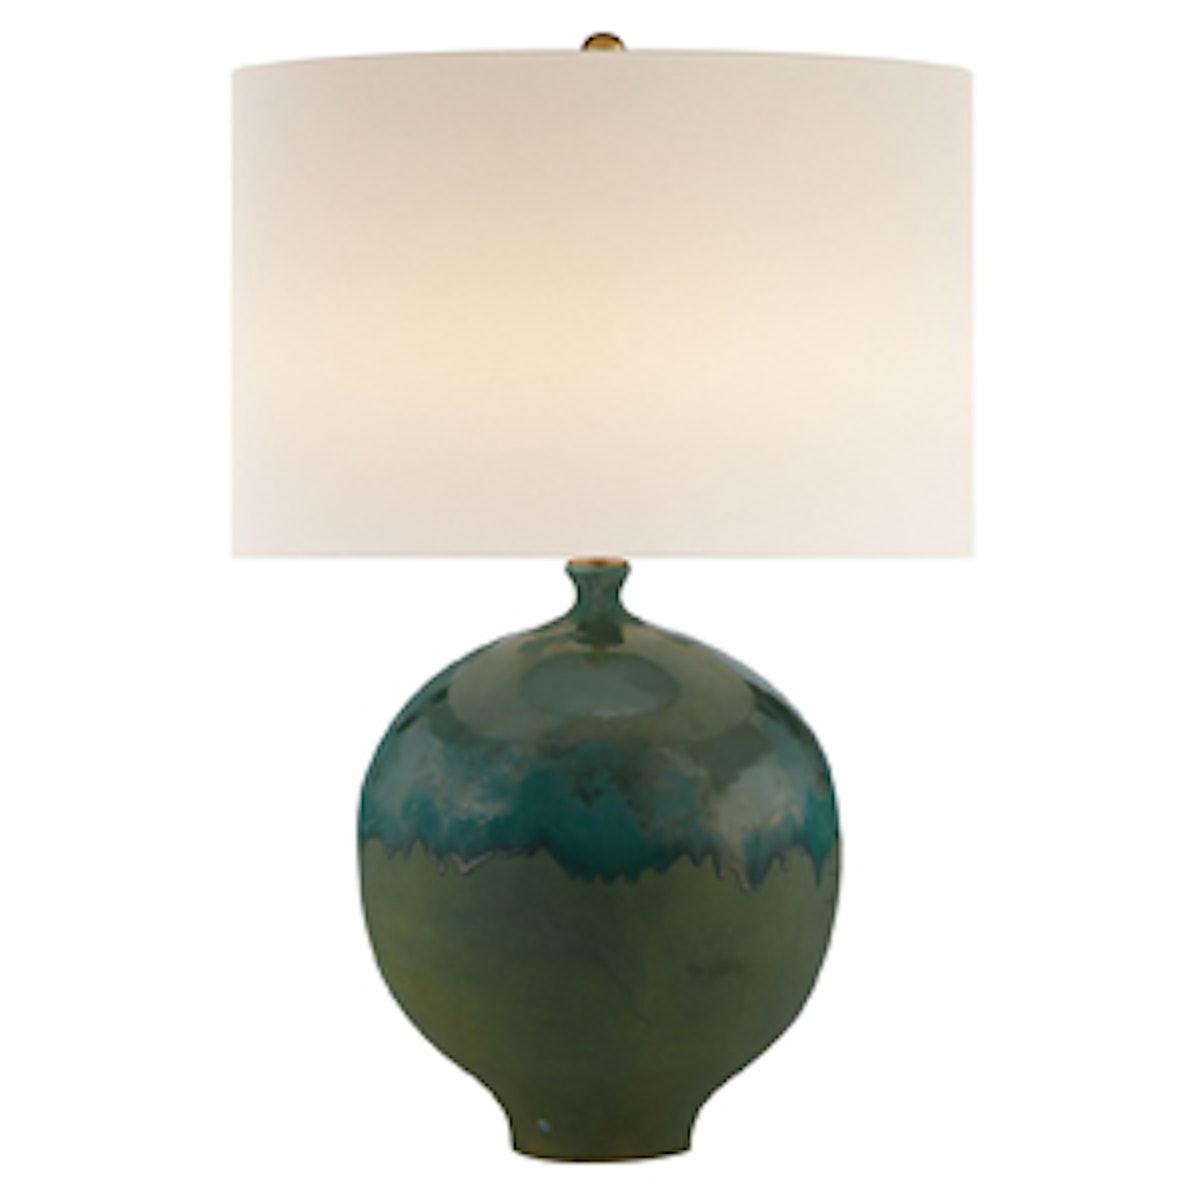 Gaios Table Lamp in Volcanic Verdi